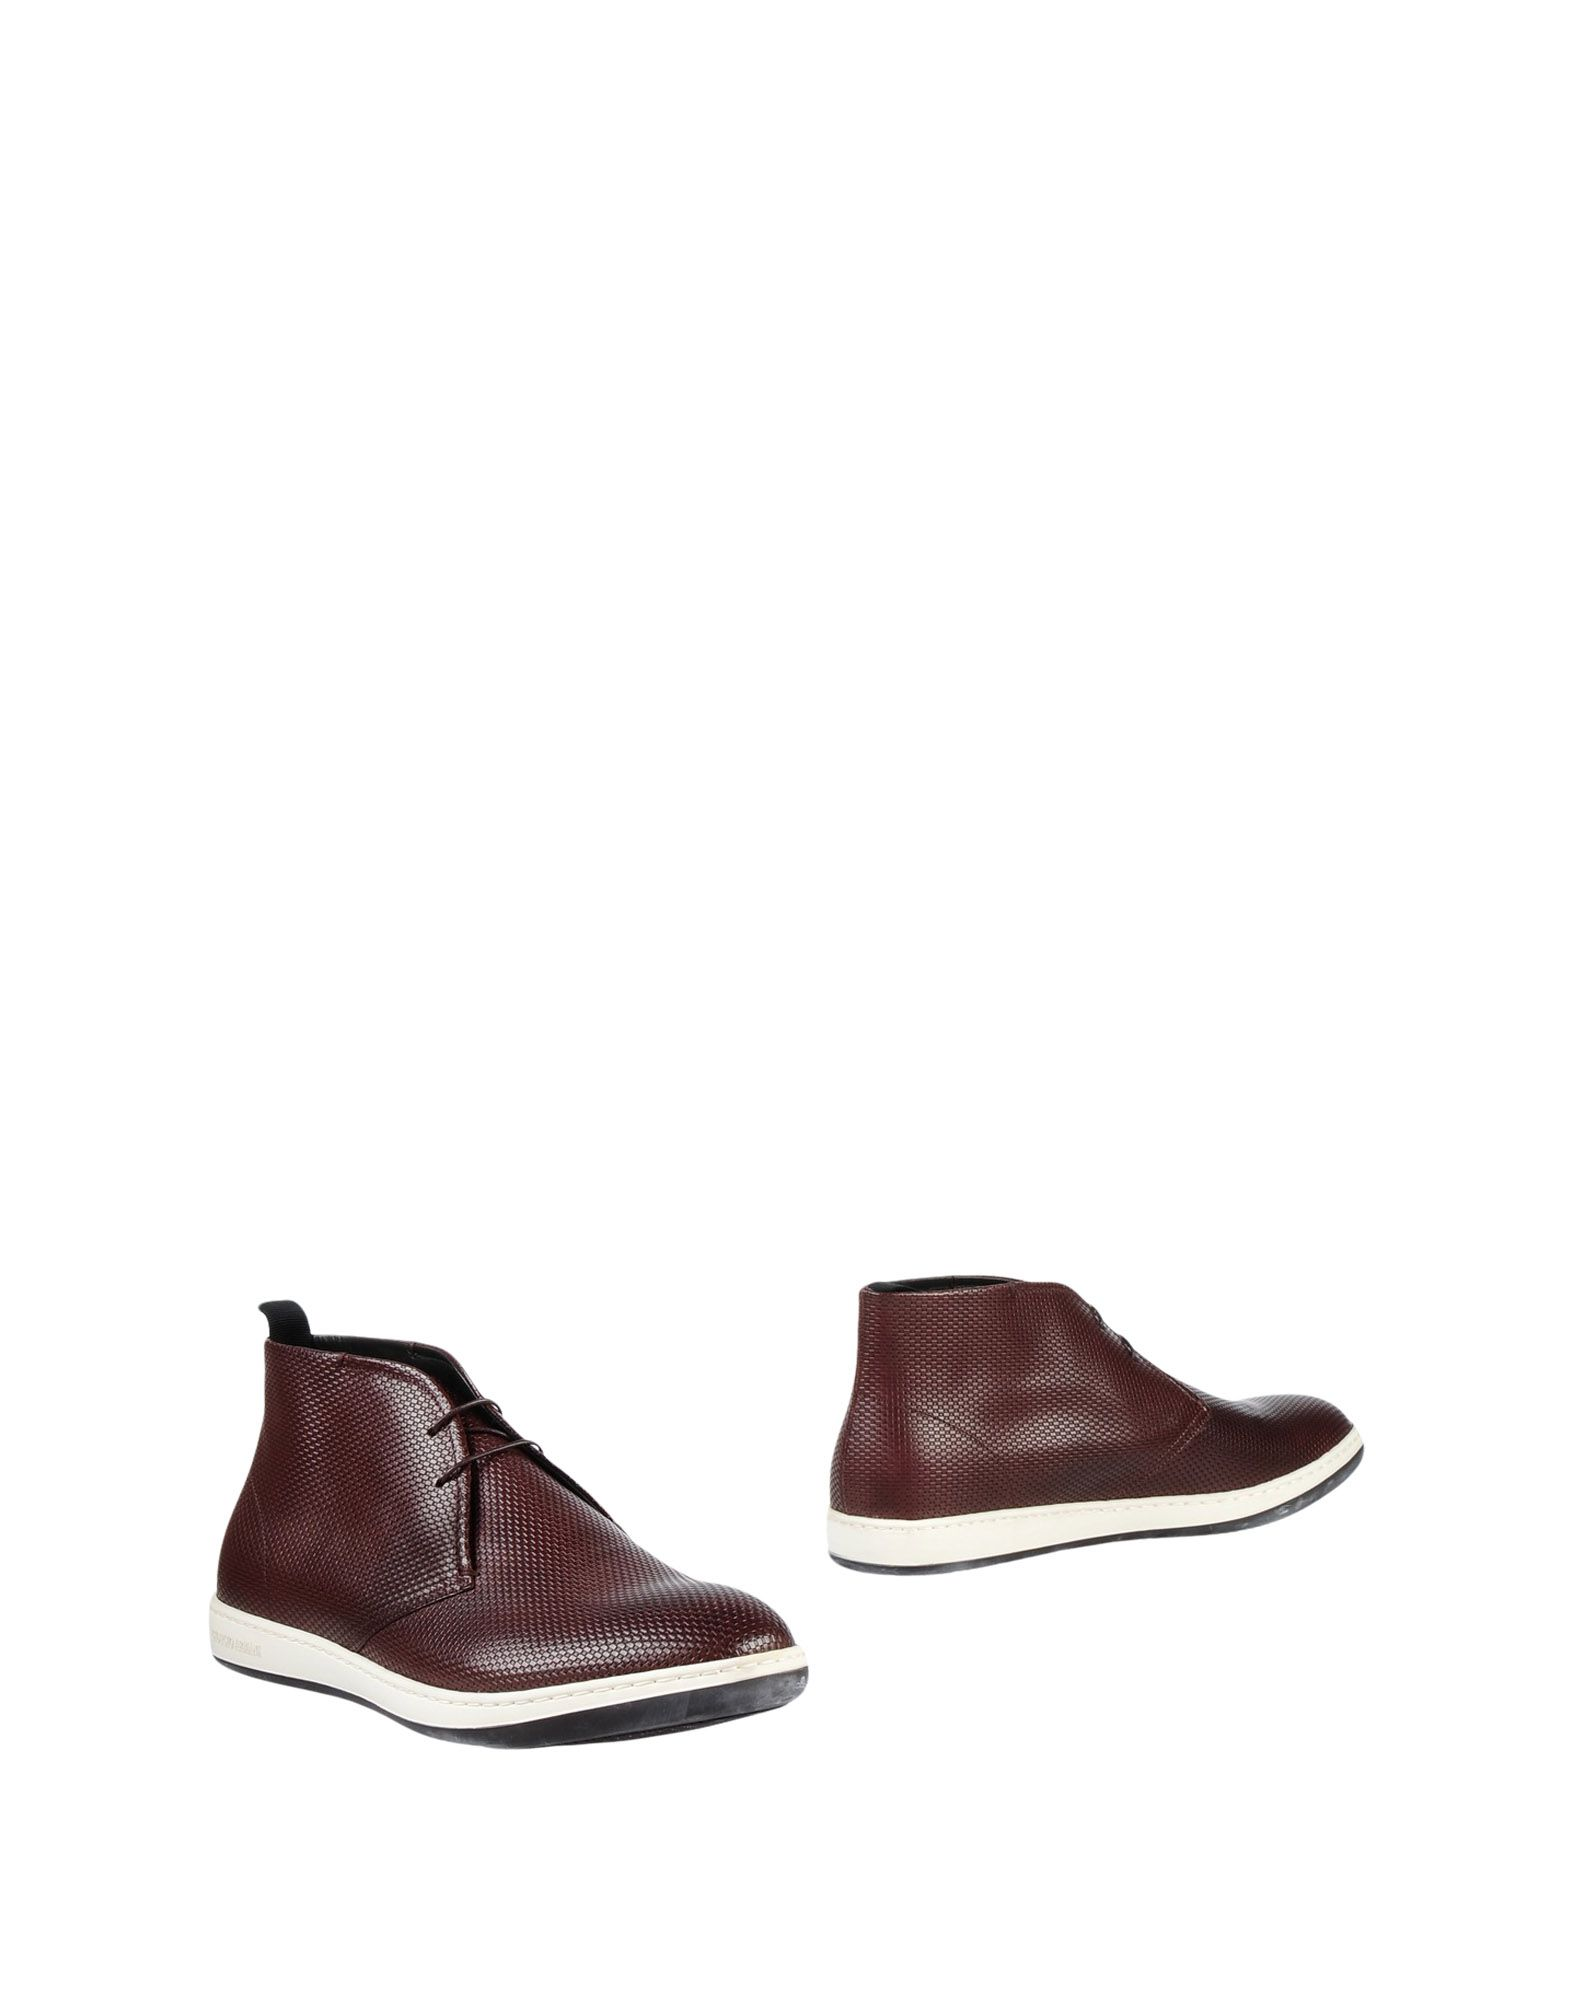 GIORGIO ARMANI Полусапоги и высокие ботинки armani junior полусапоги и высокие ботинки